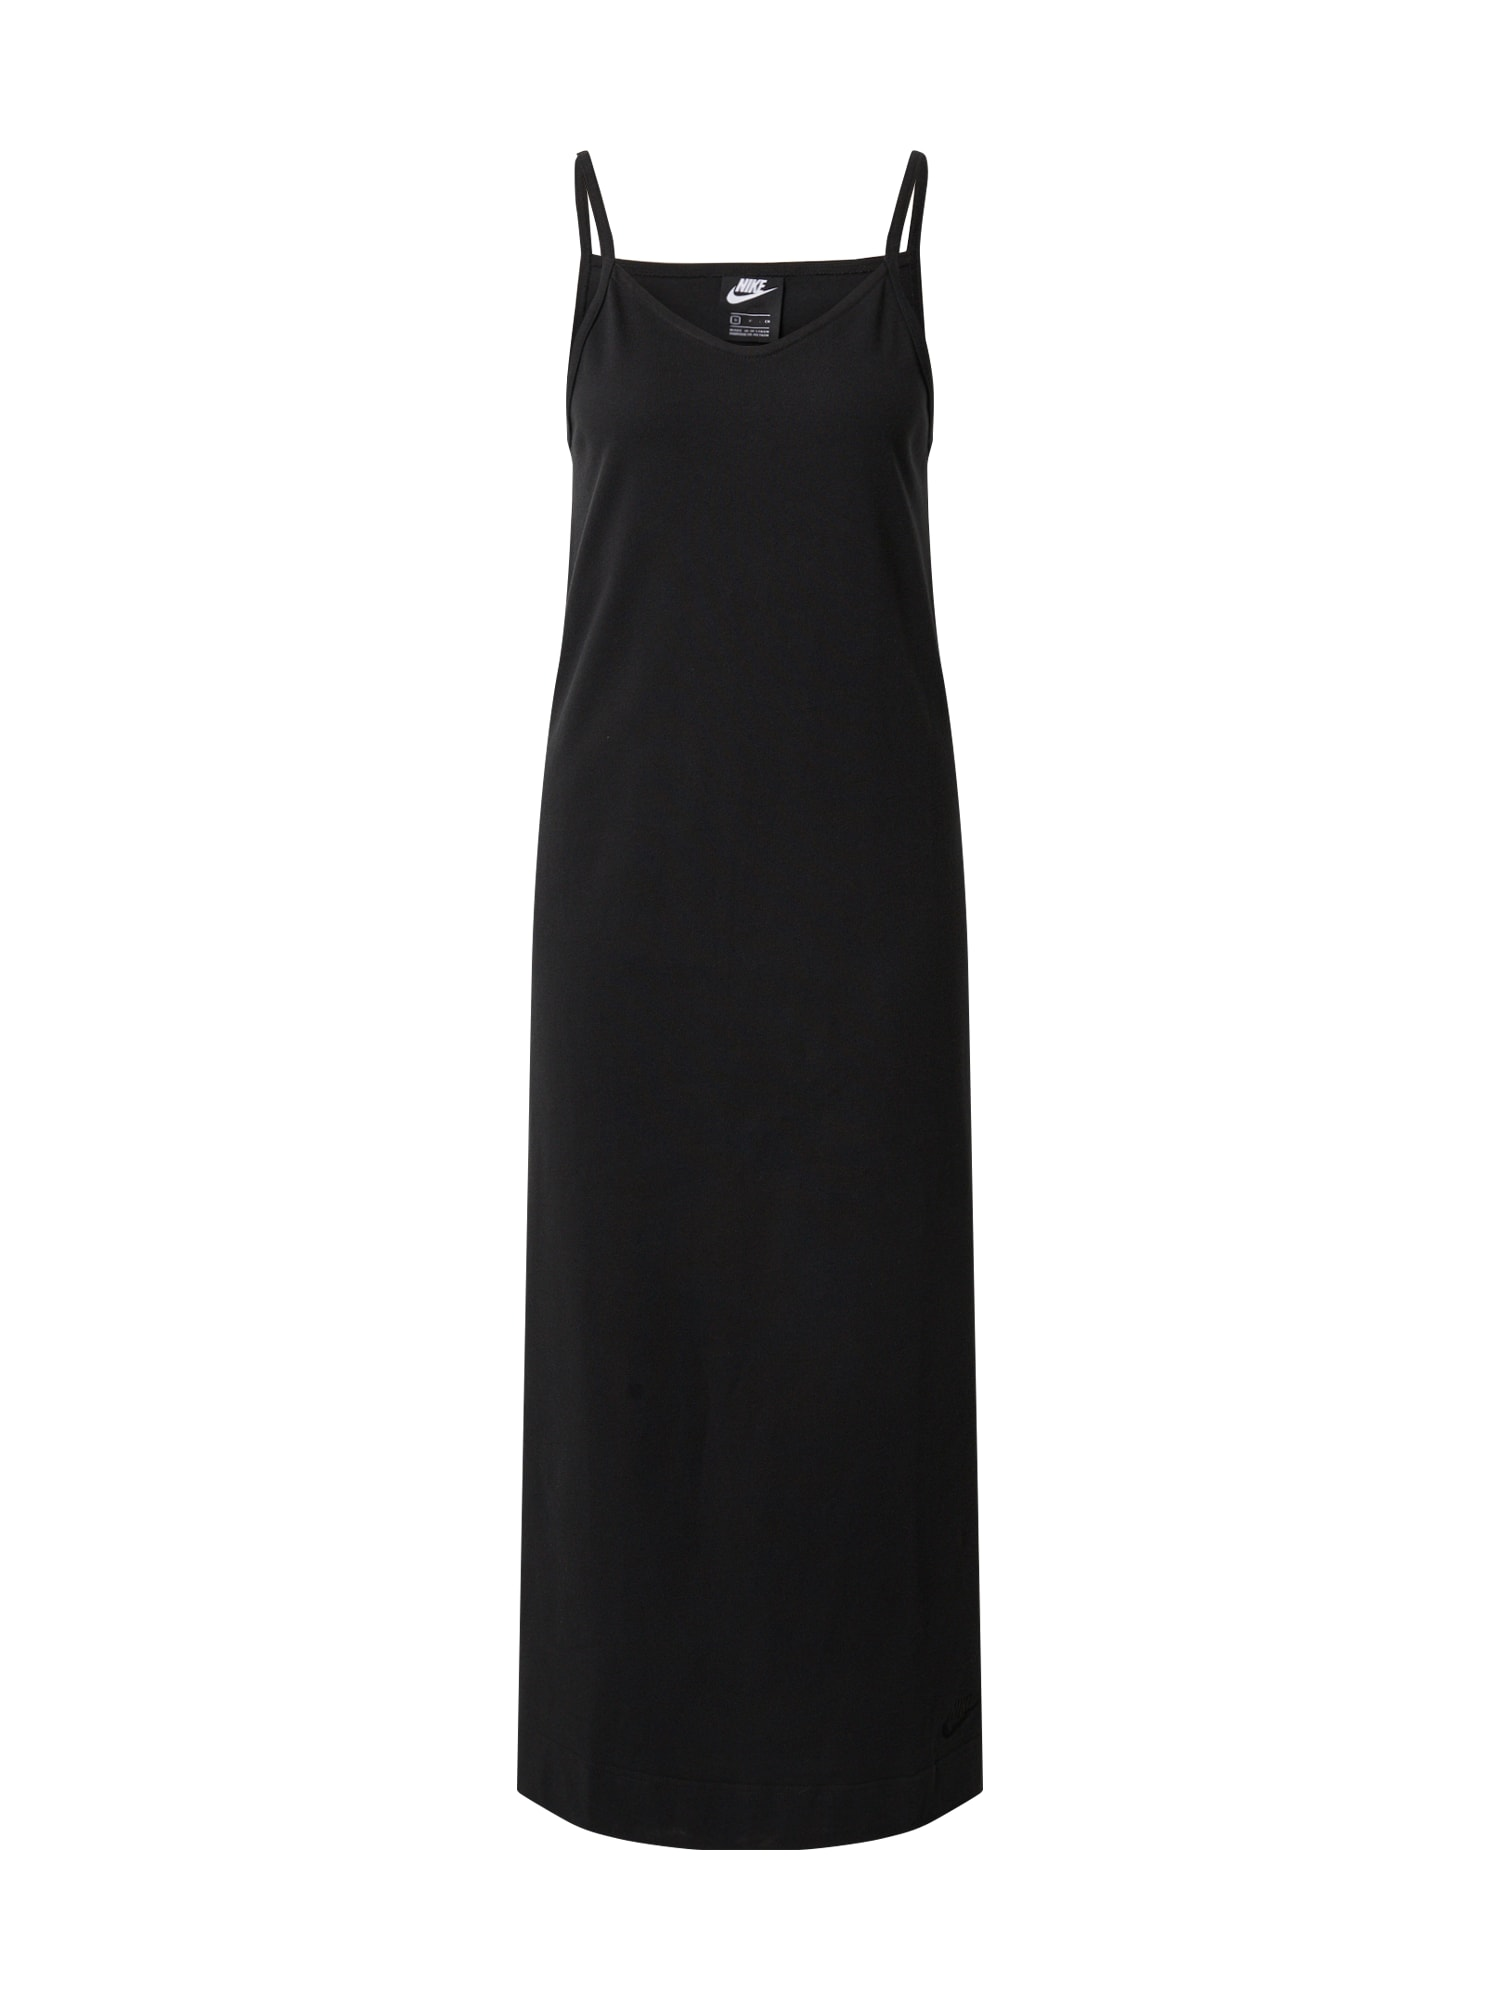 Nike Sportswear Suknelė juoda